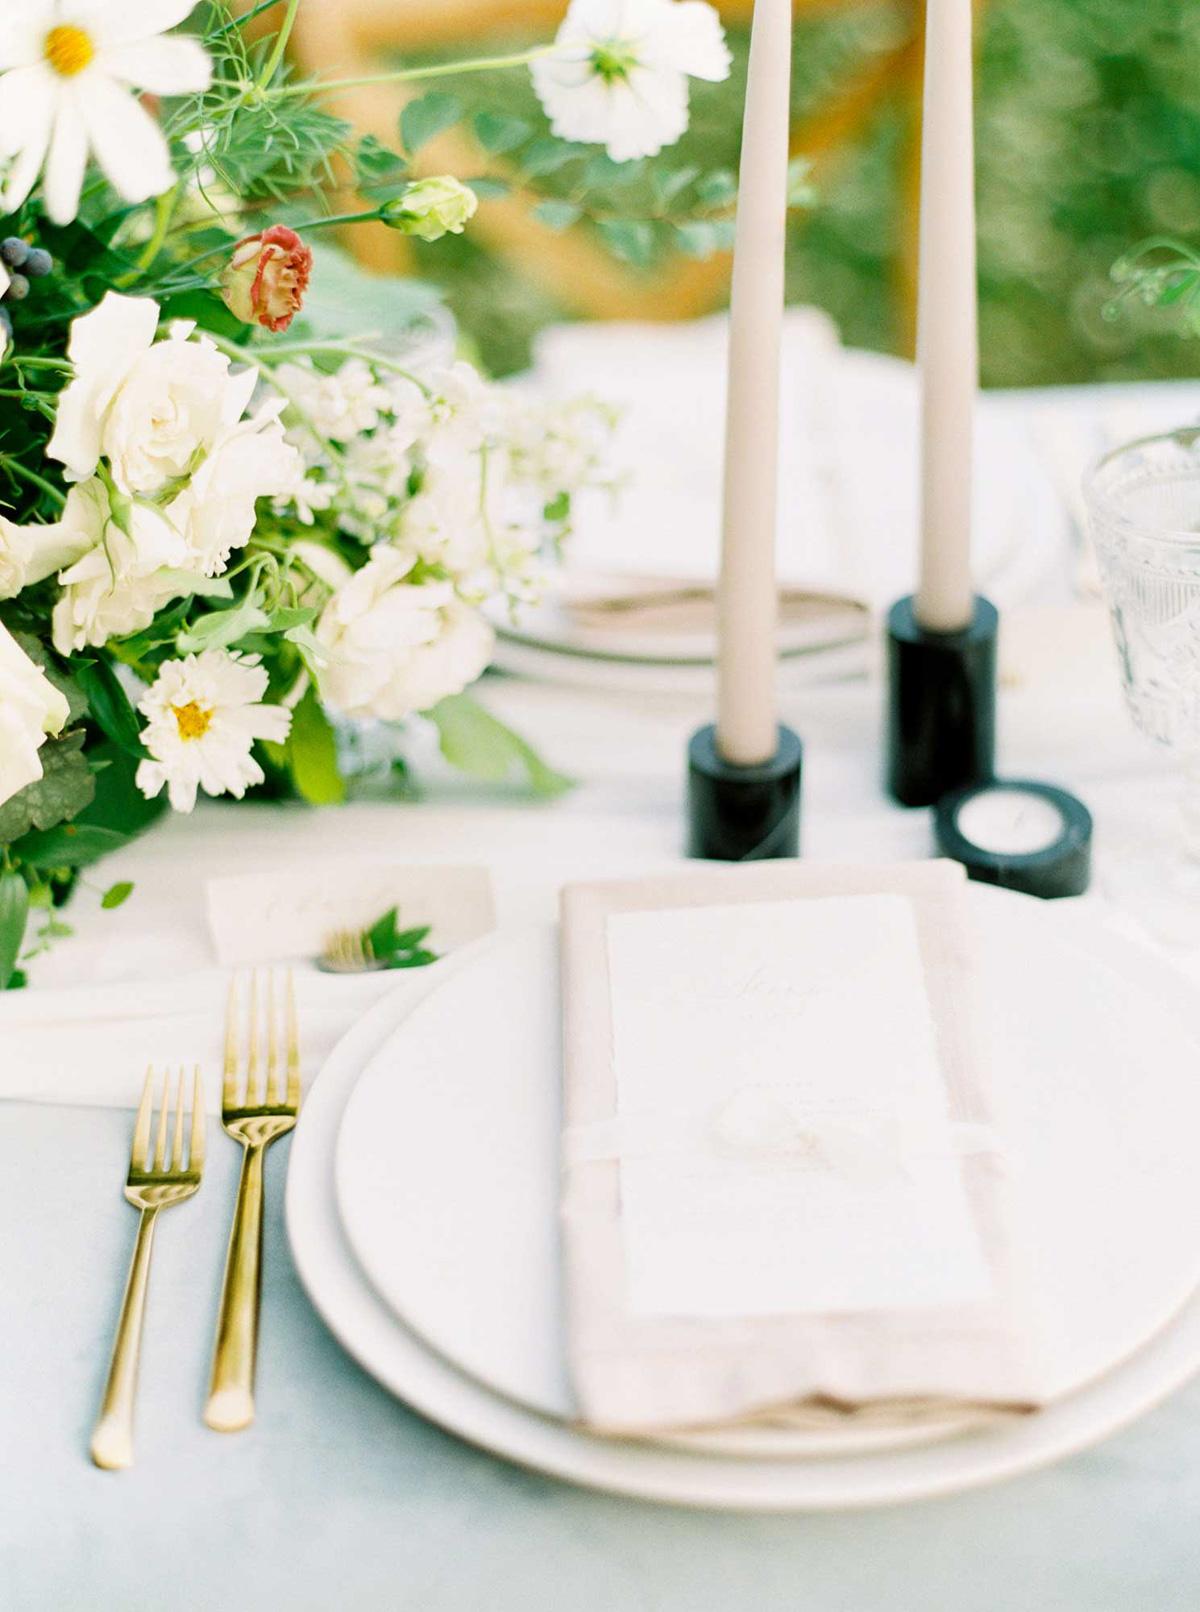 kayla-yestal-vineyard-bride-swish-list-woodland-weddings-niagara-wedding-editorial-57.jpg